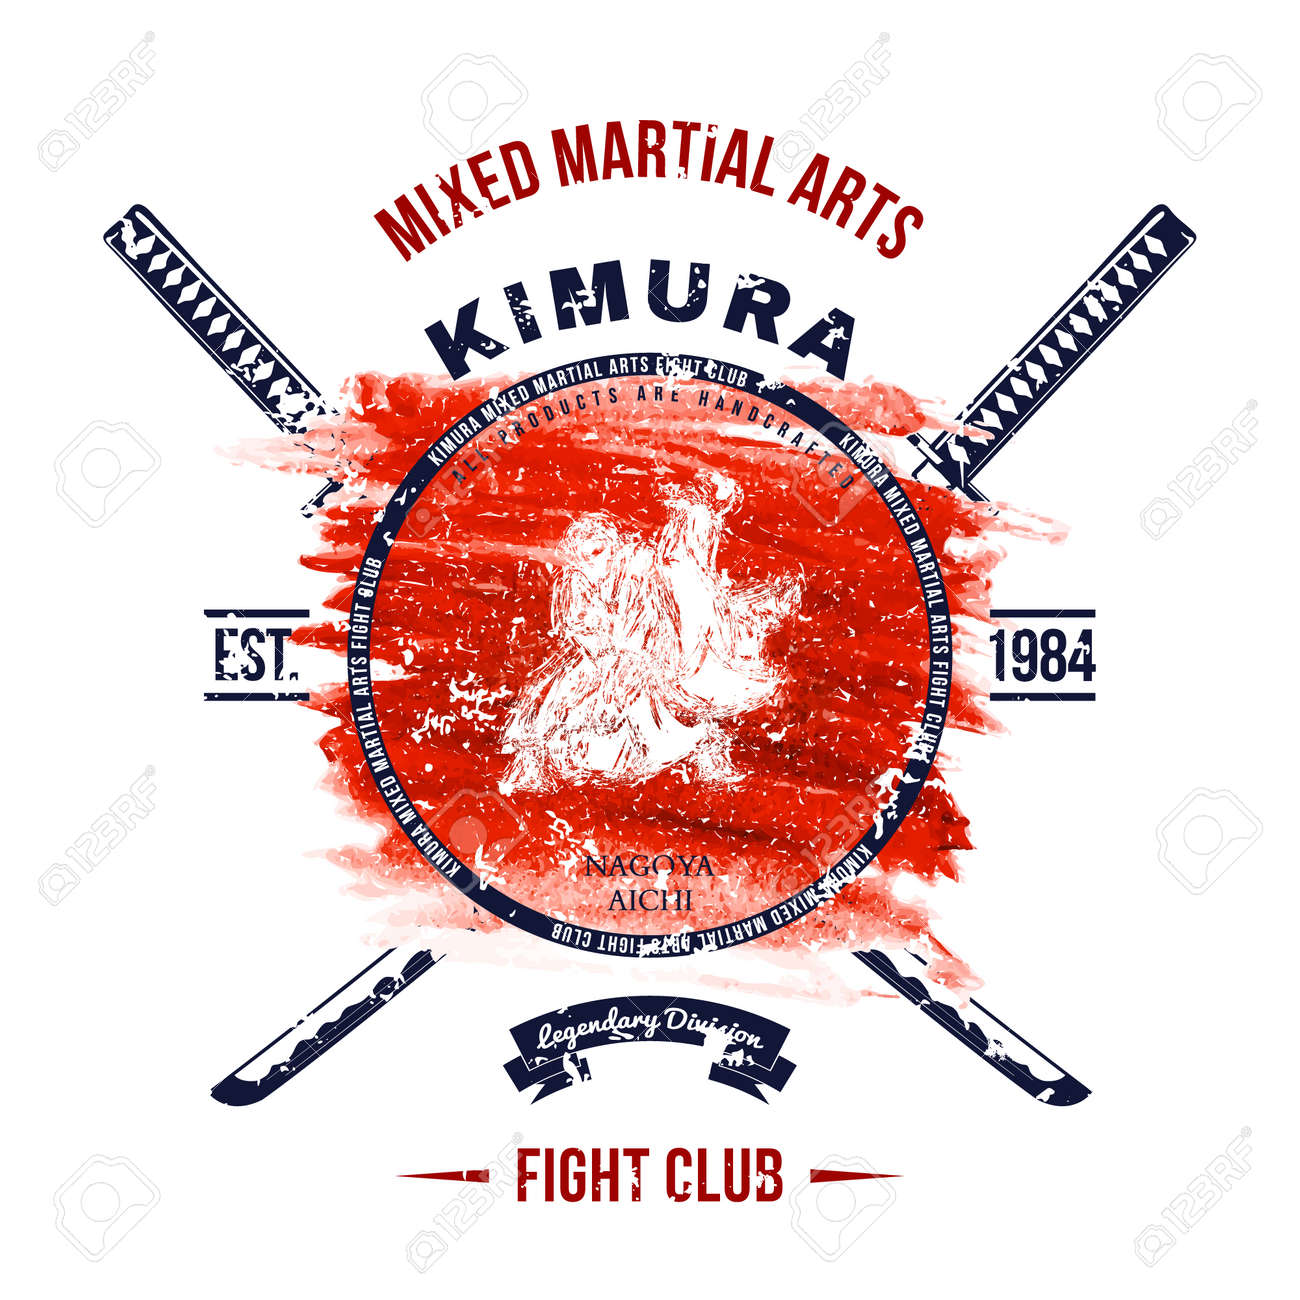 Fight Club Grunge print with samurai swords - 47207471